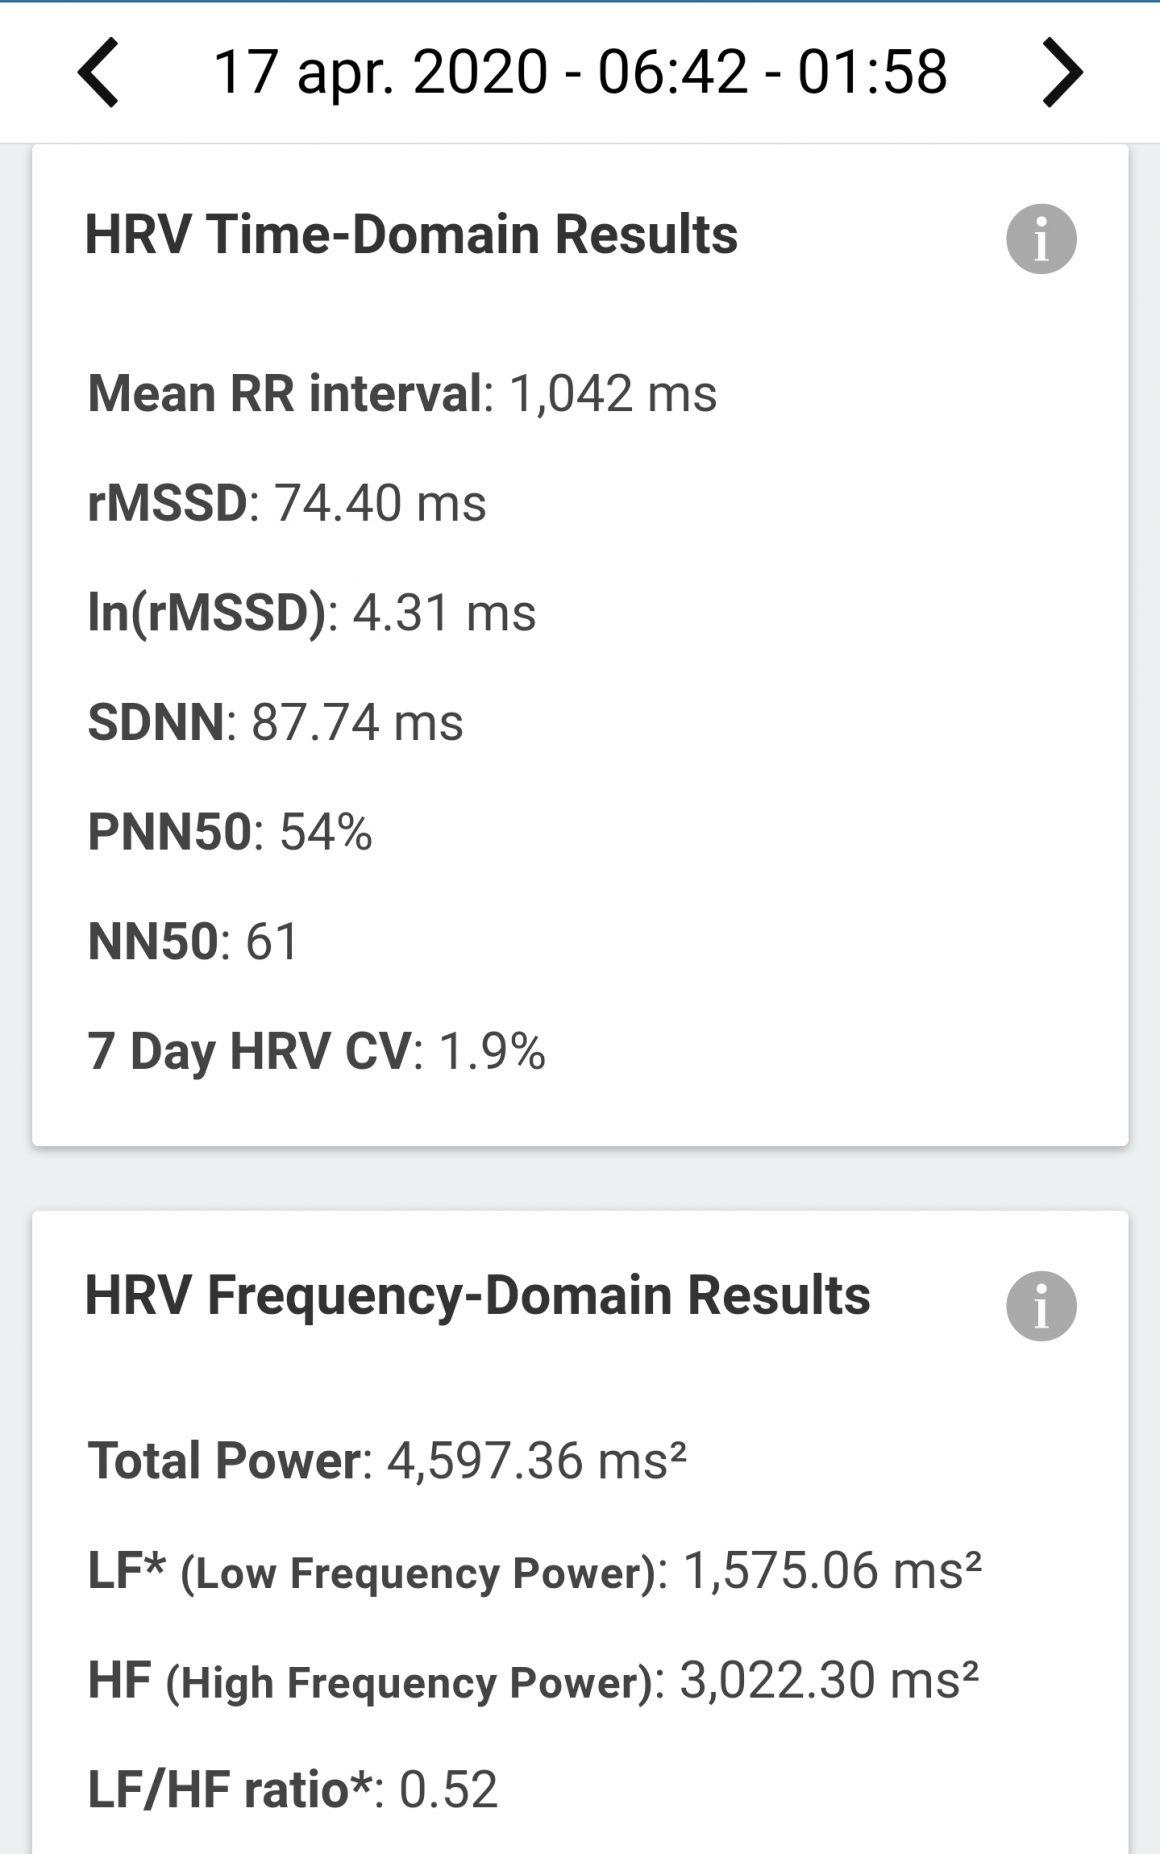 HRV statistieken